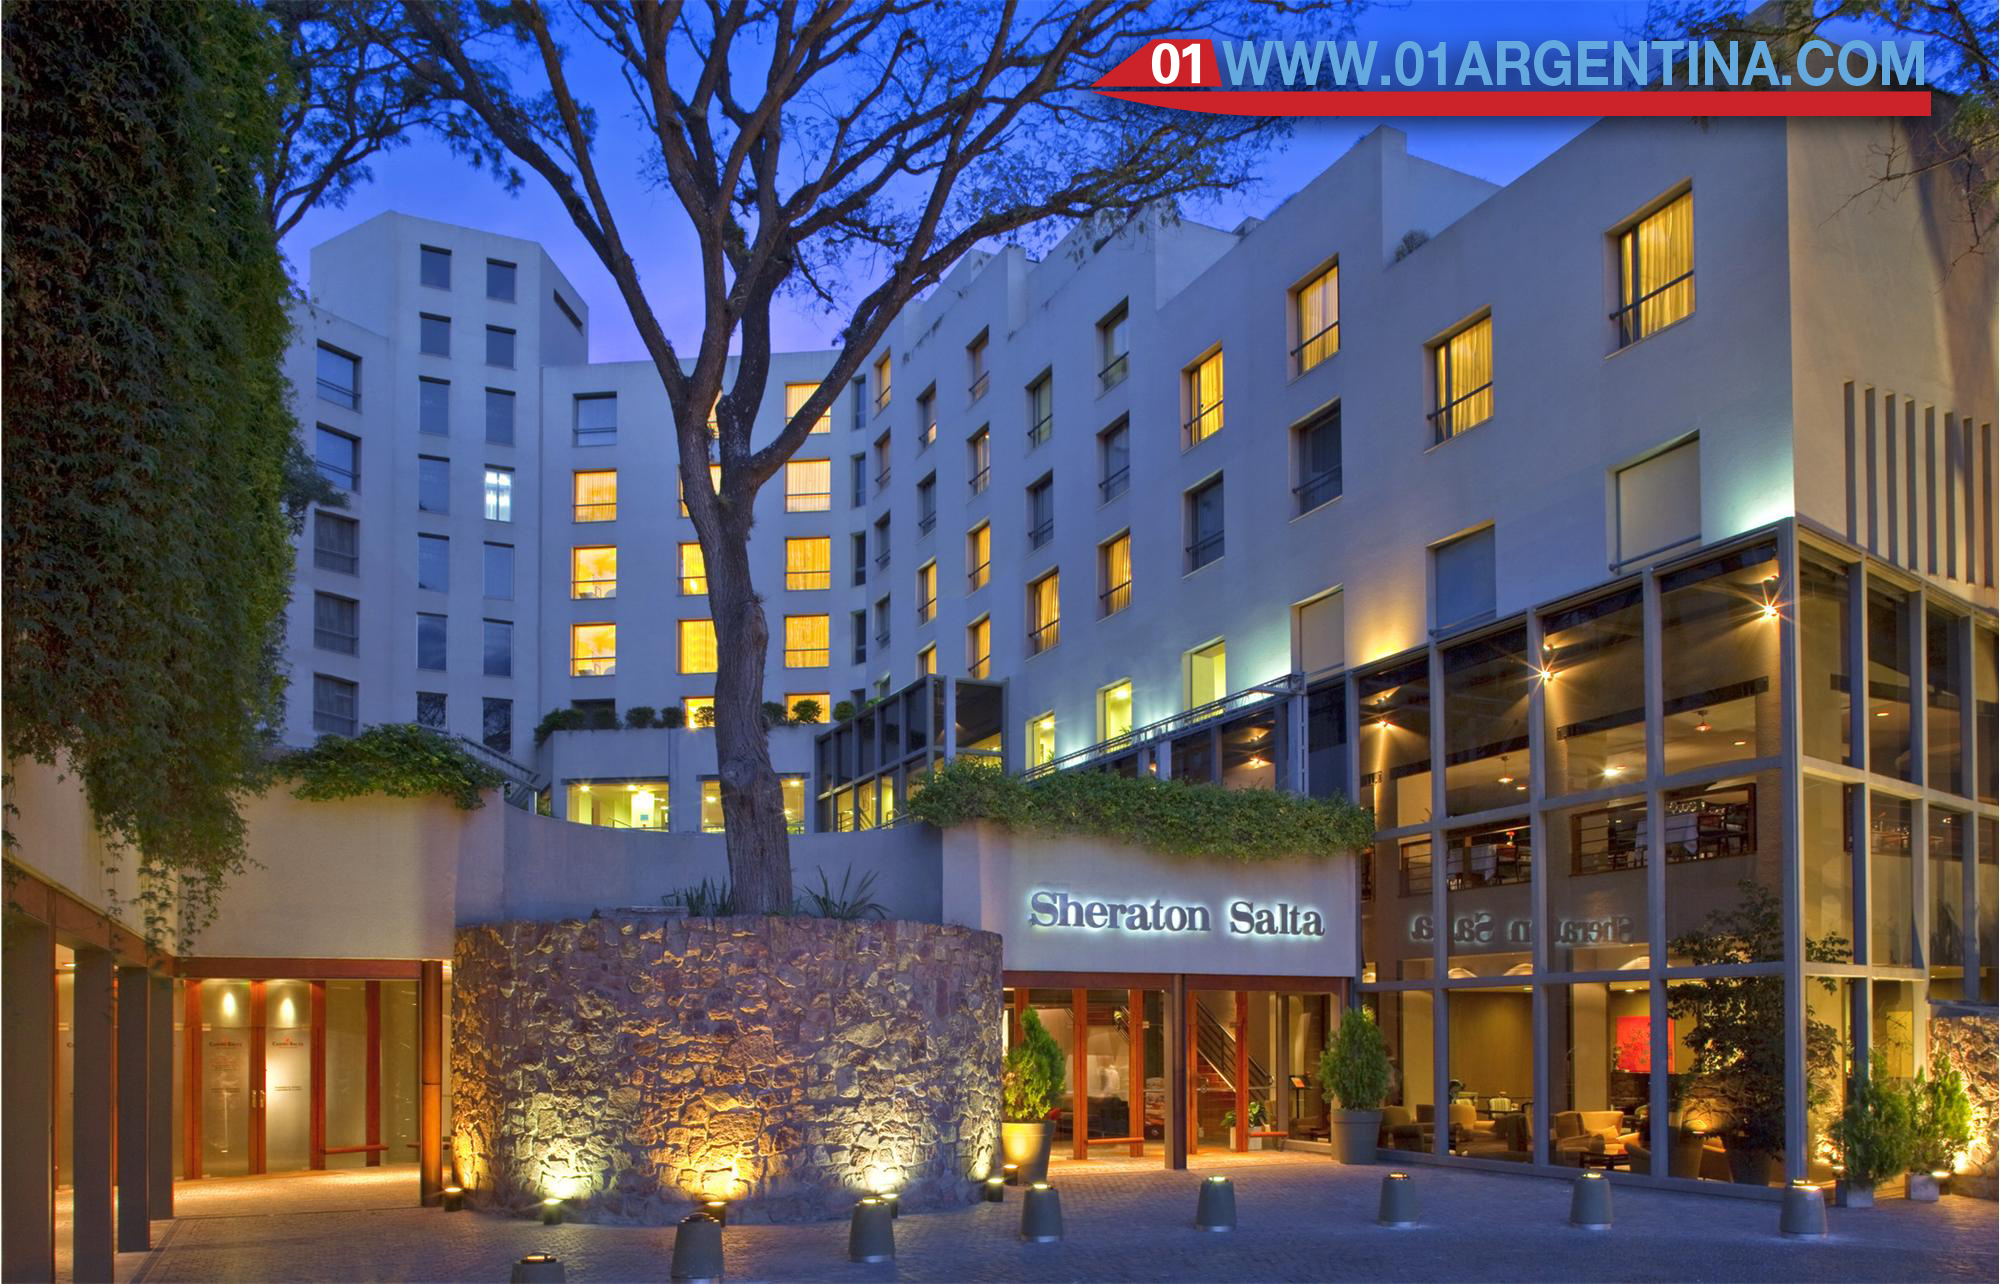 Luxury Hotels In Salta Bariloche Buenos Aires And Mendoza